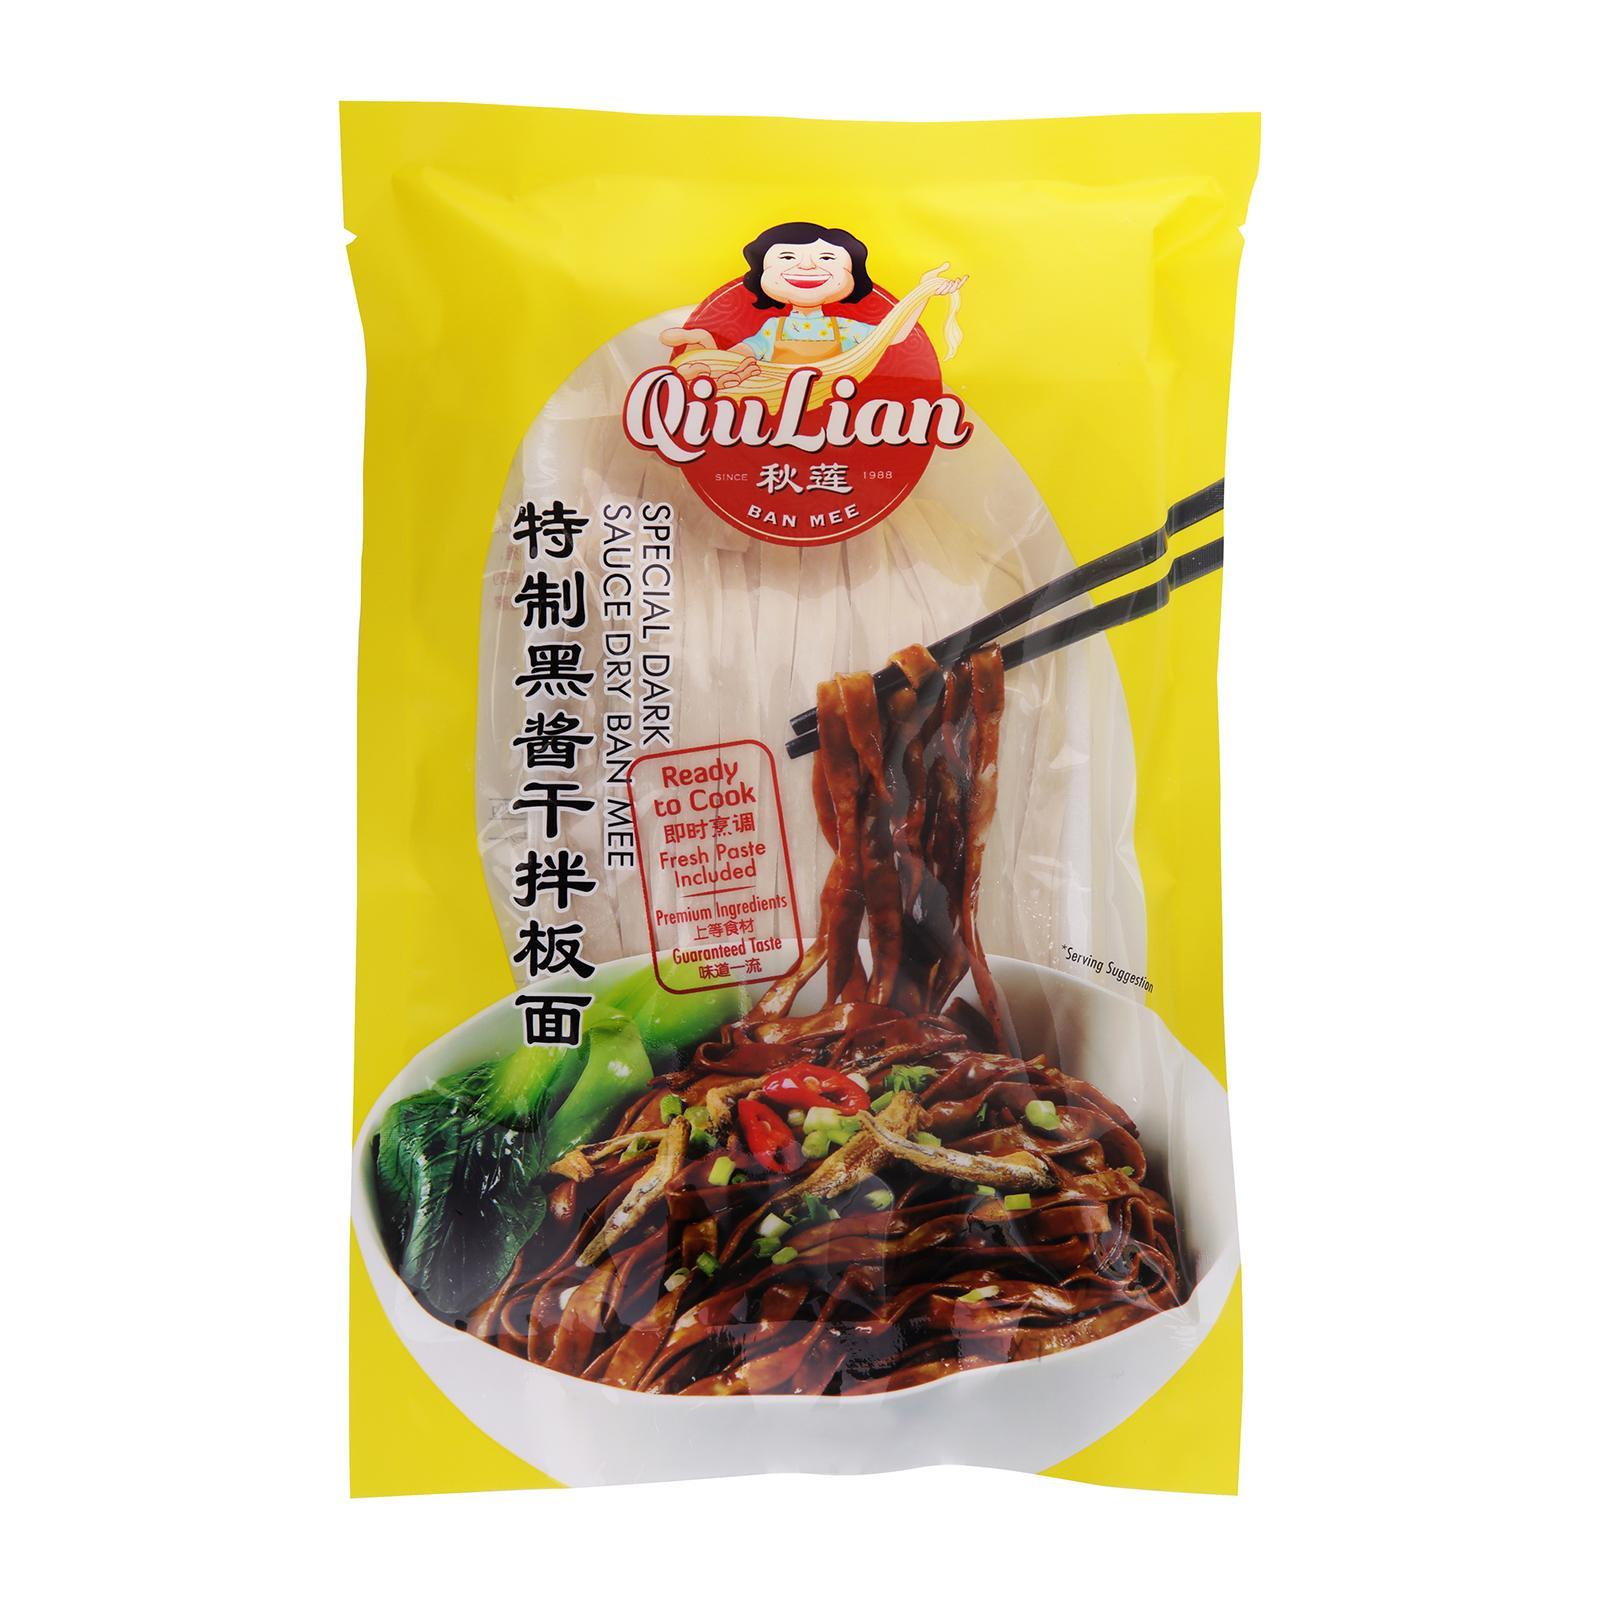 Qiu Lian Ban Mee Qiu Lian Special Dark Sauce Dry Ban Mee By Redmart.